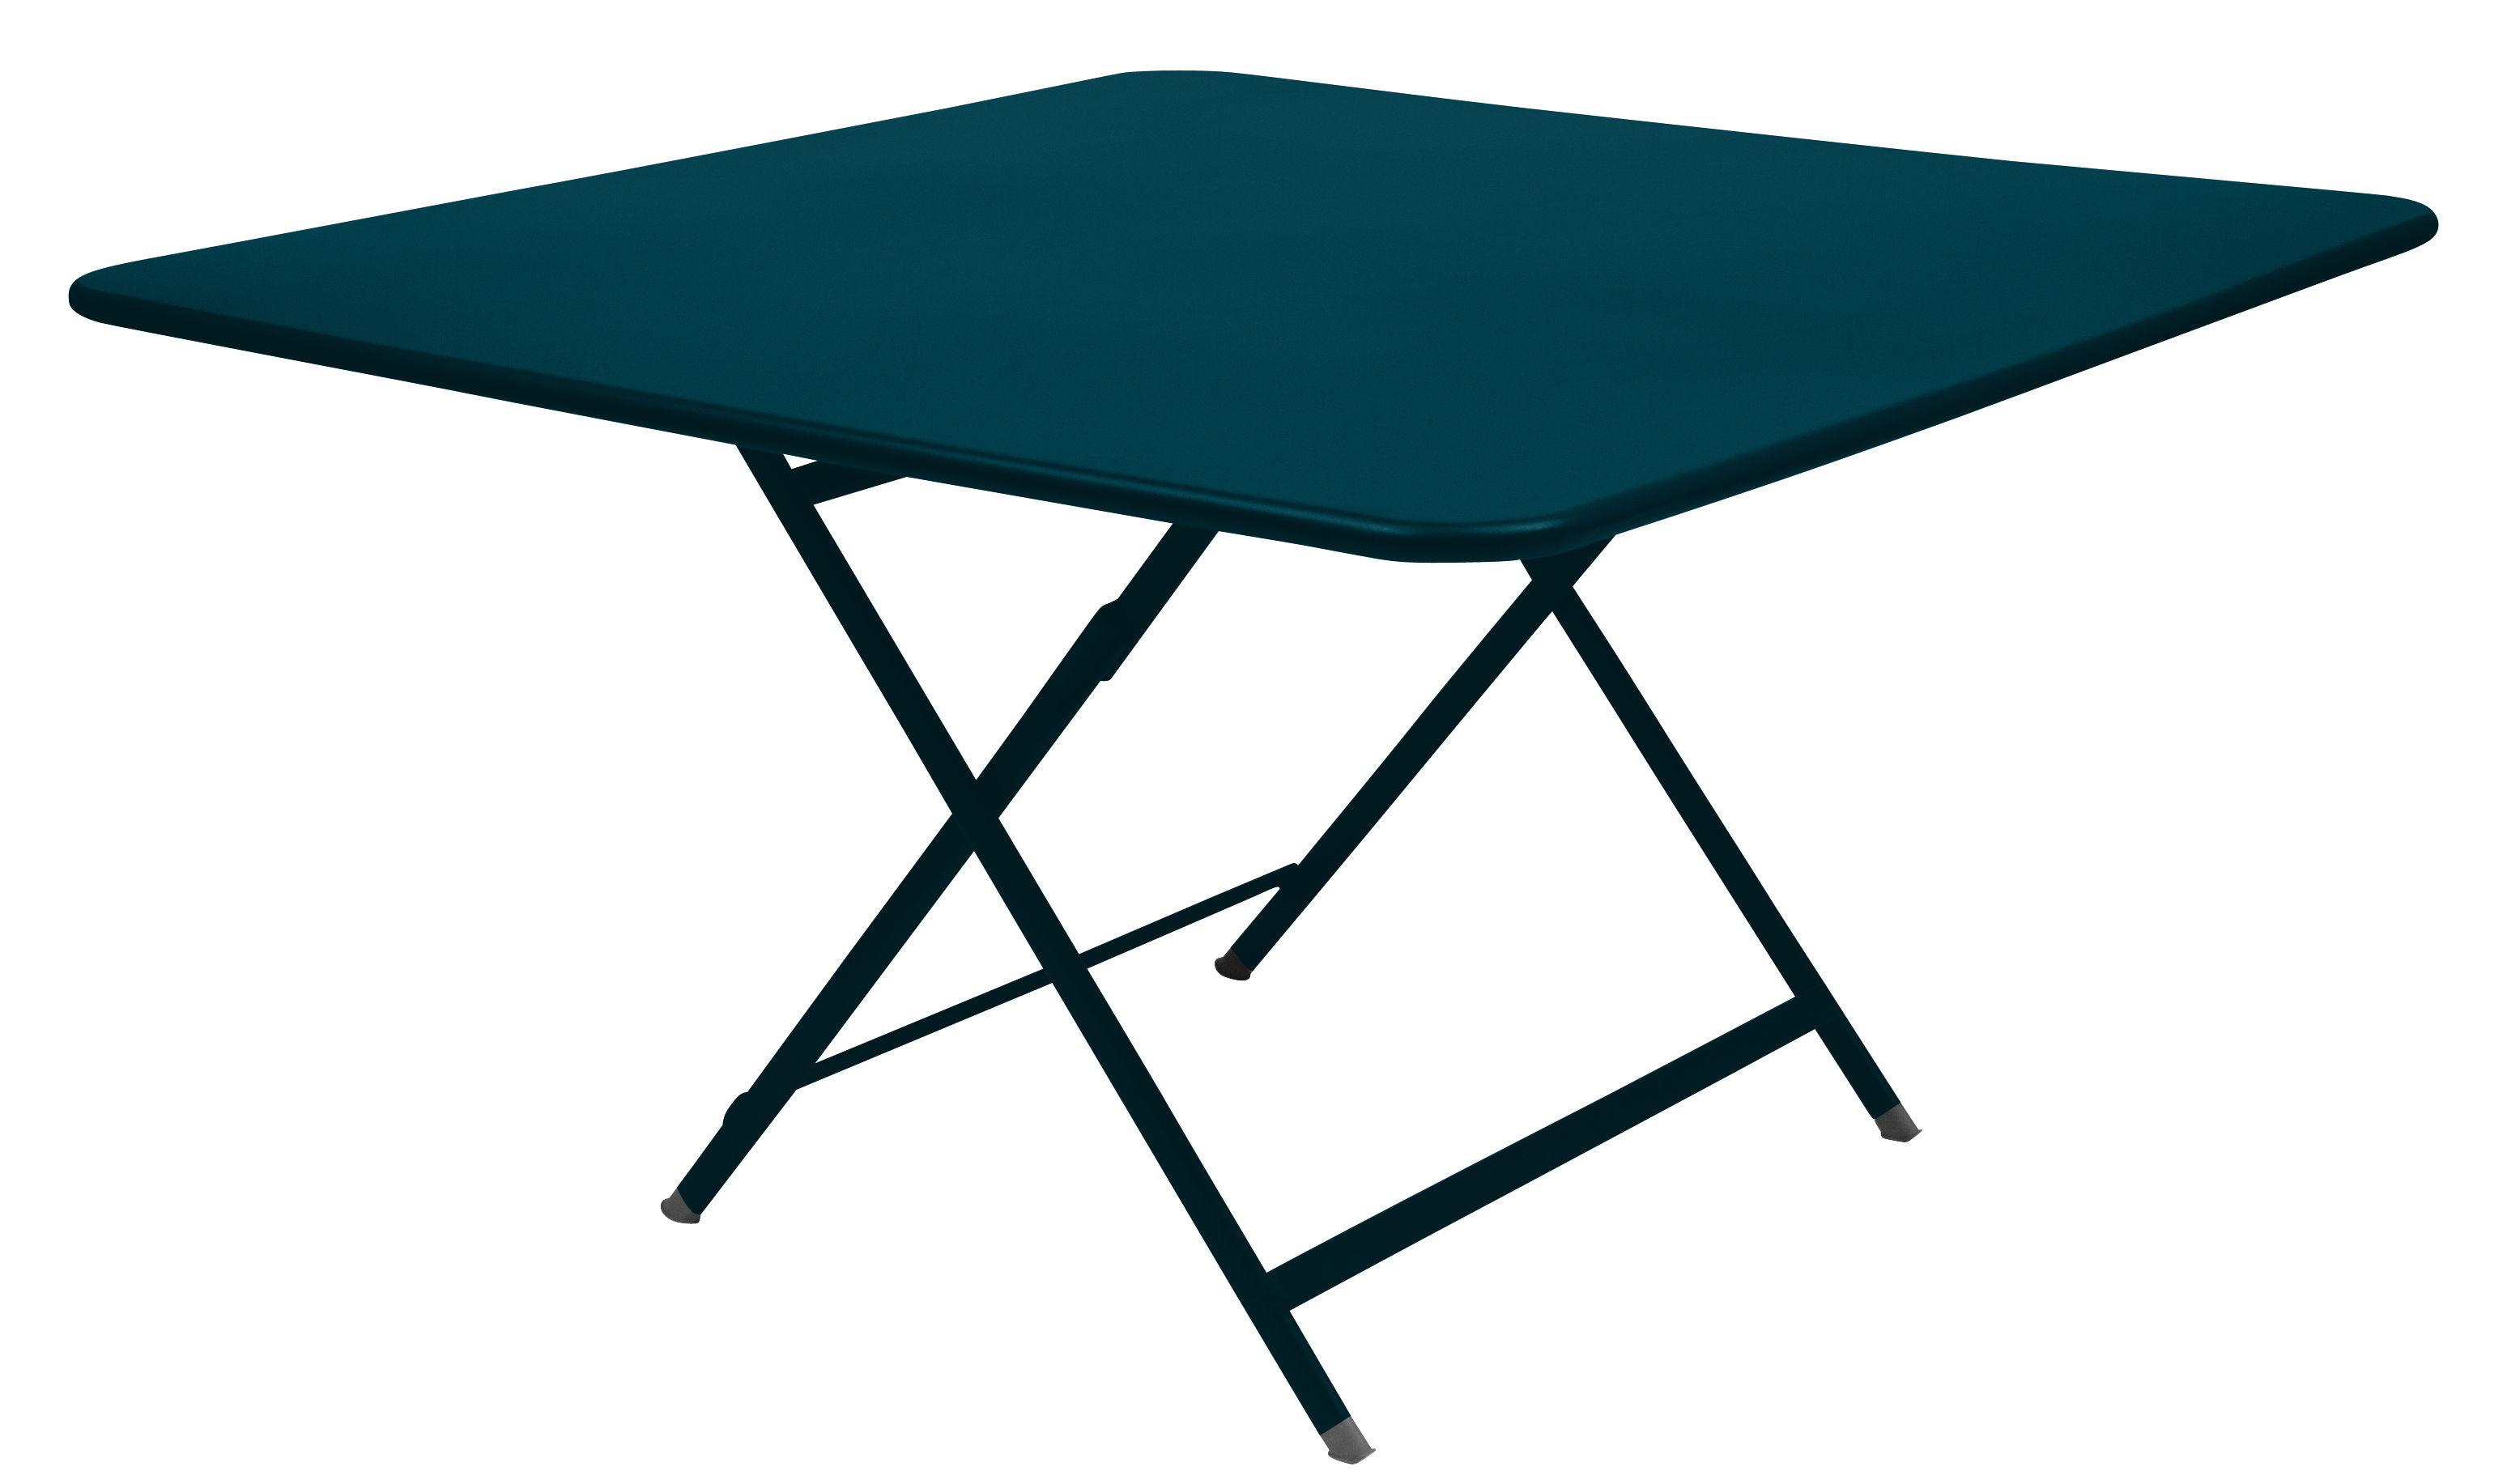 Outdoor - Tables de jardin - Table pliante Caractère / 128 x 128 cm - Fermob - Bleu Acapulco - Acier laqué